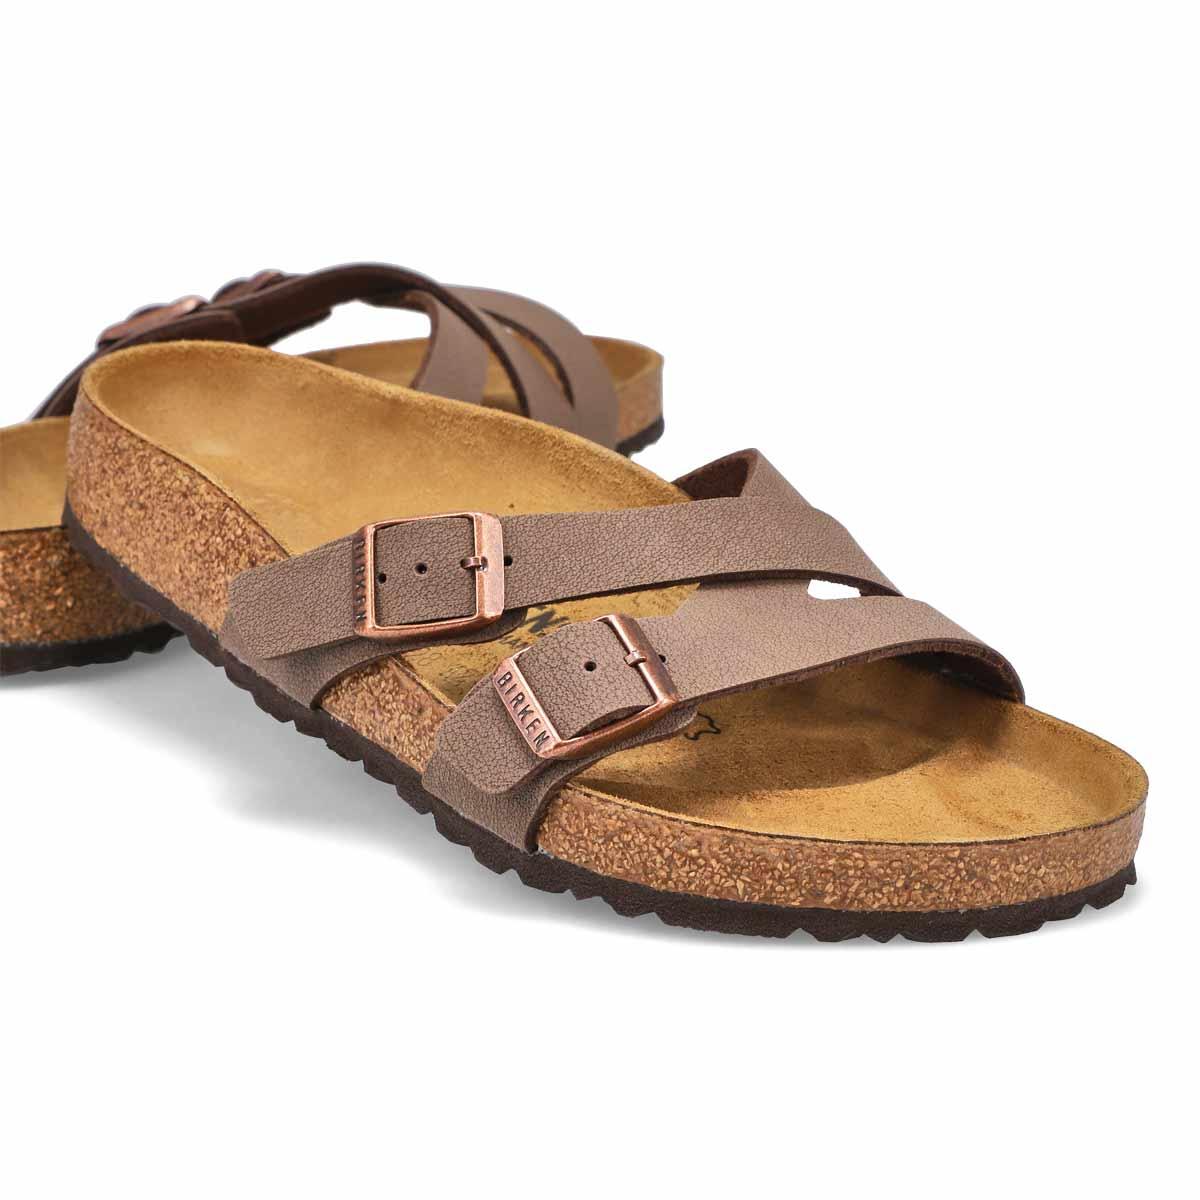 Lds Yao mocha 2 stap sandal